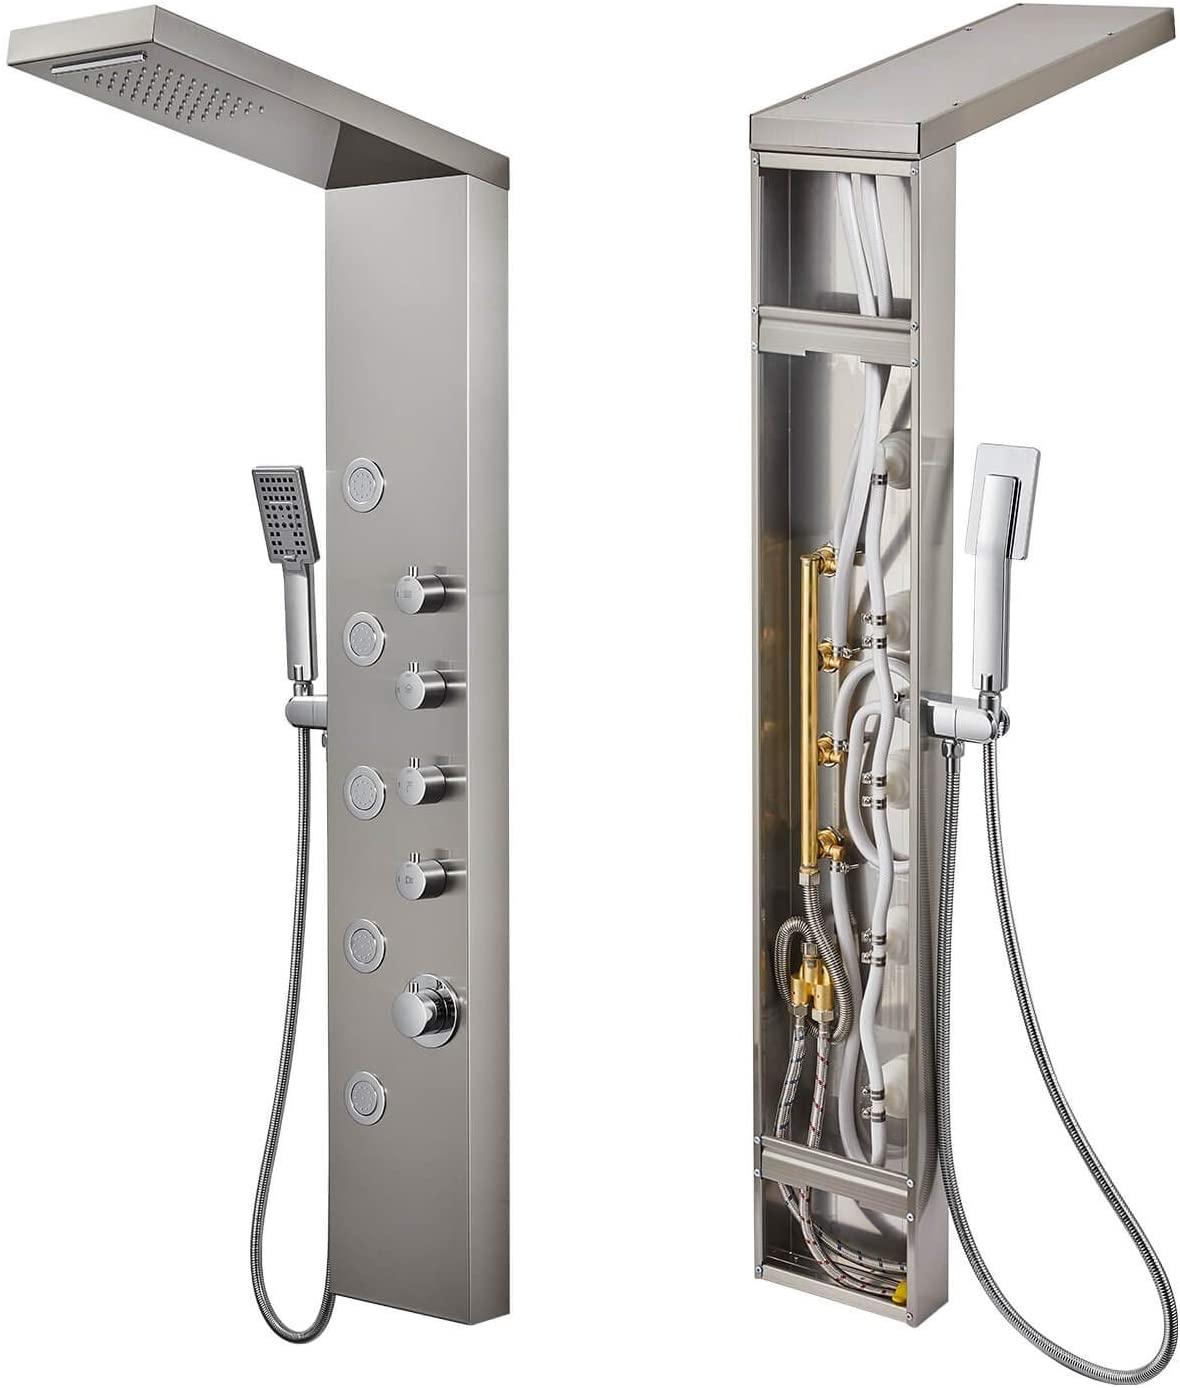 Buy Delta Shower Tower Panel System